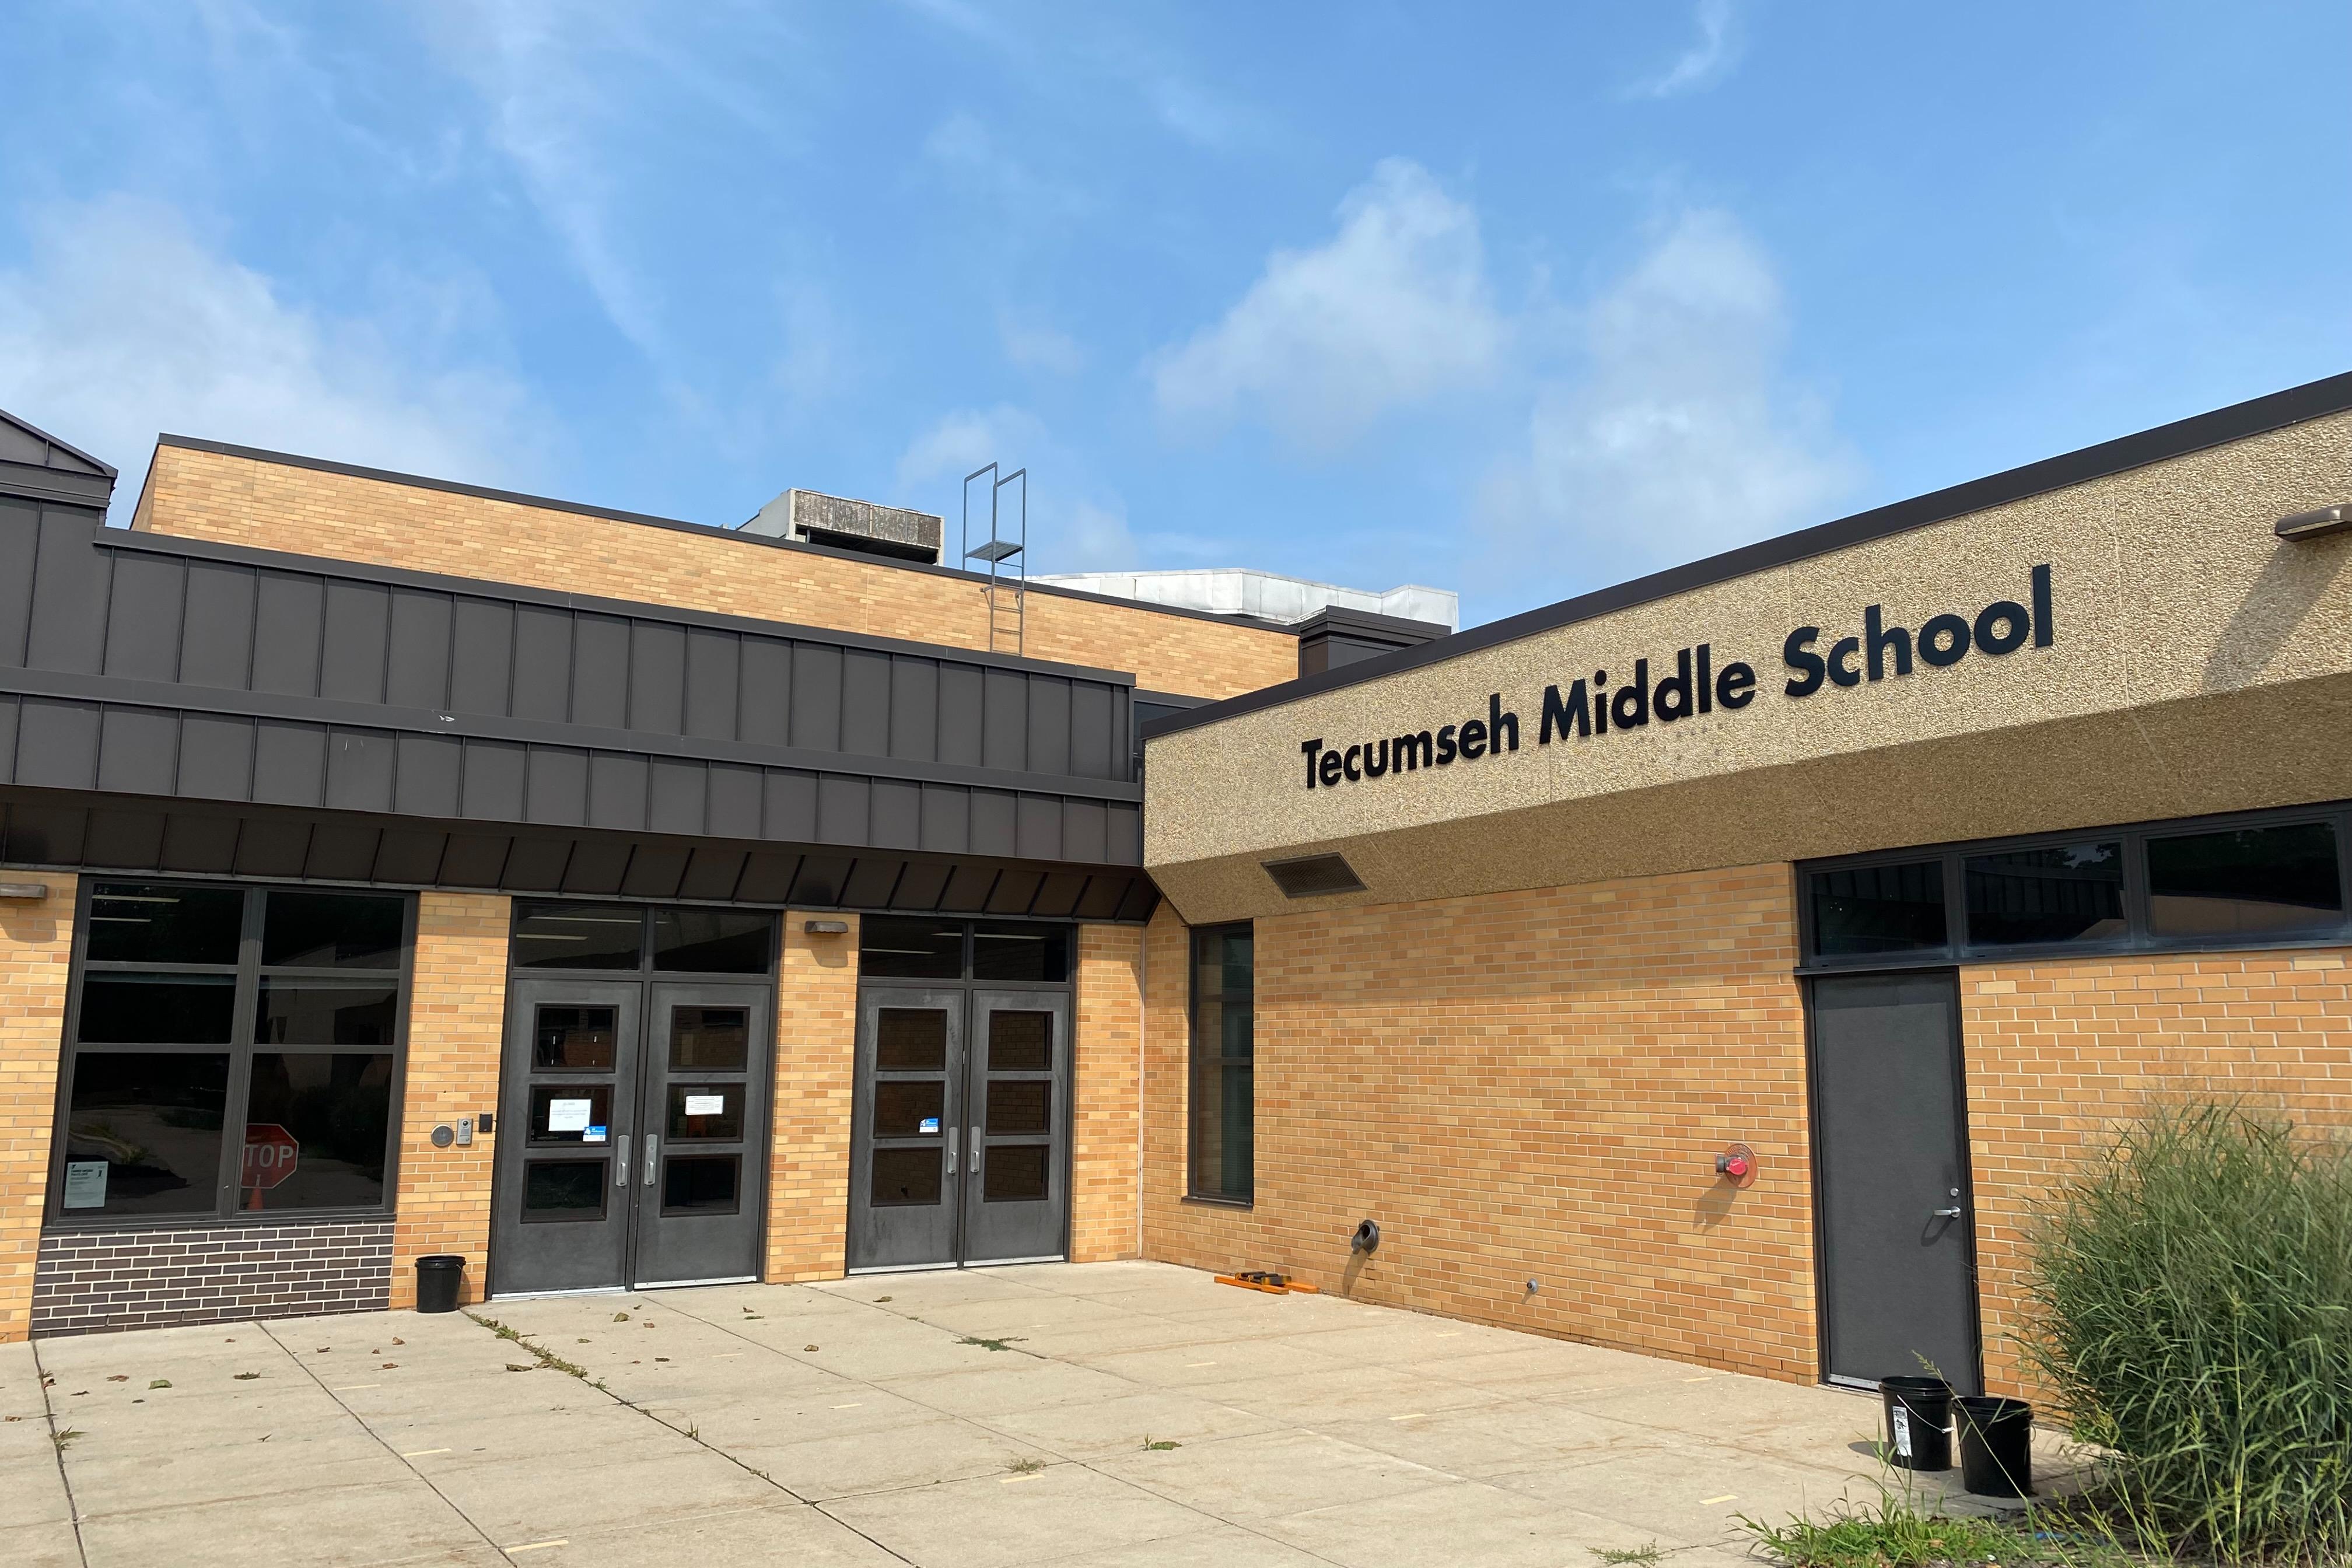 Tecumseh Middle School